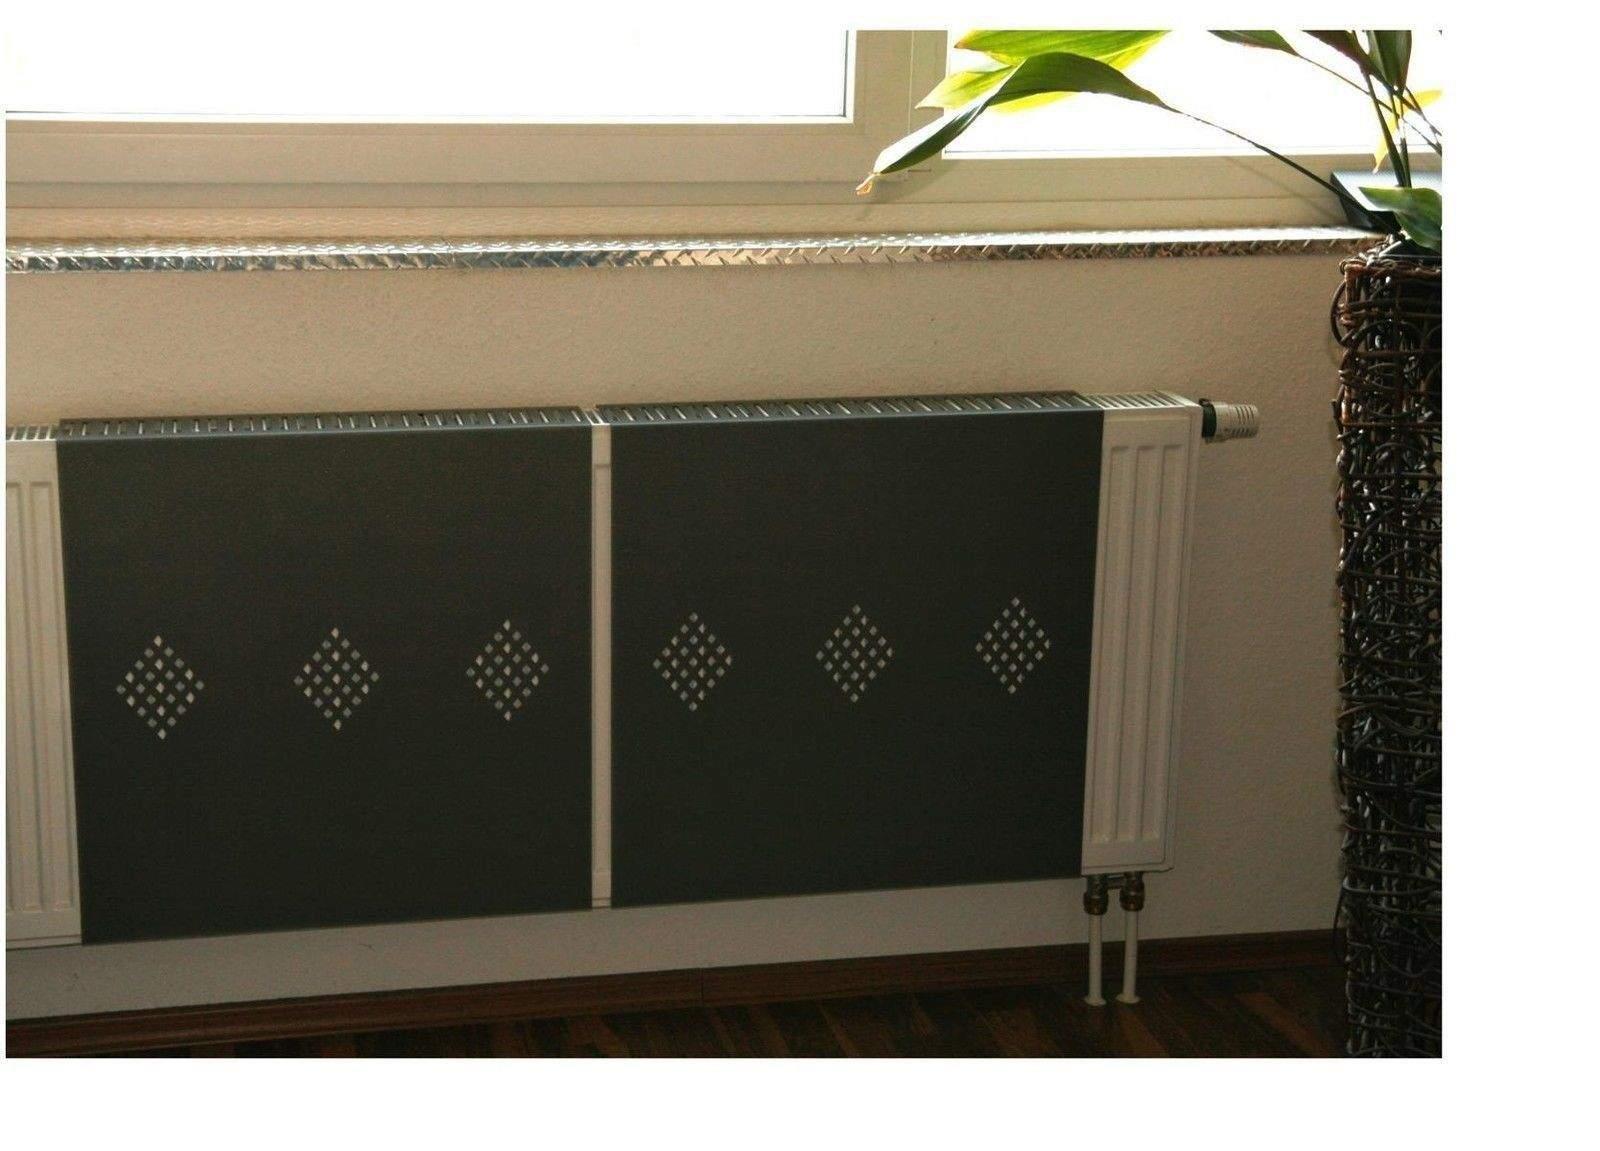 Full Size of Wandheizkörper Wandheizkrper Wohnzimmer Neu Heizkrperverkleidung Wohnzimmer Wandheizkörper